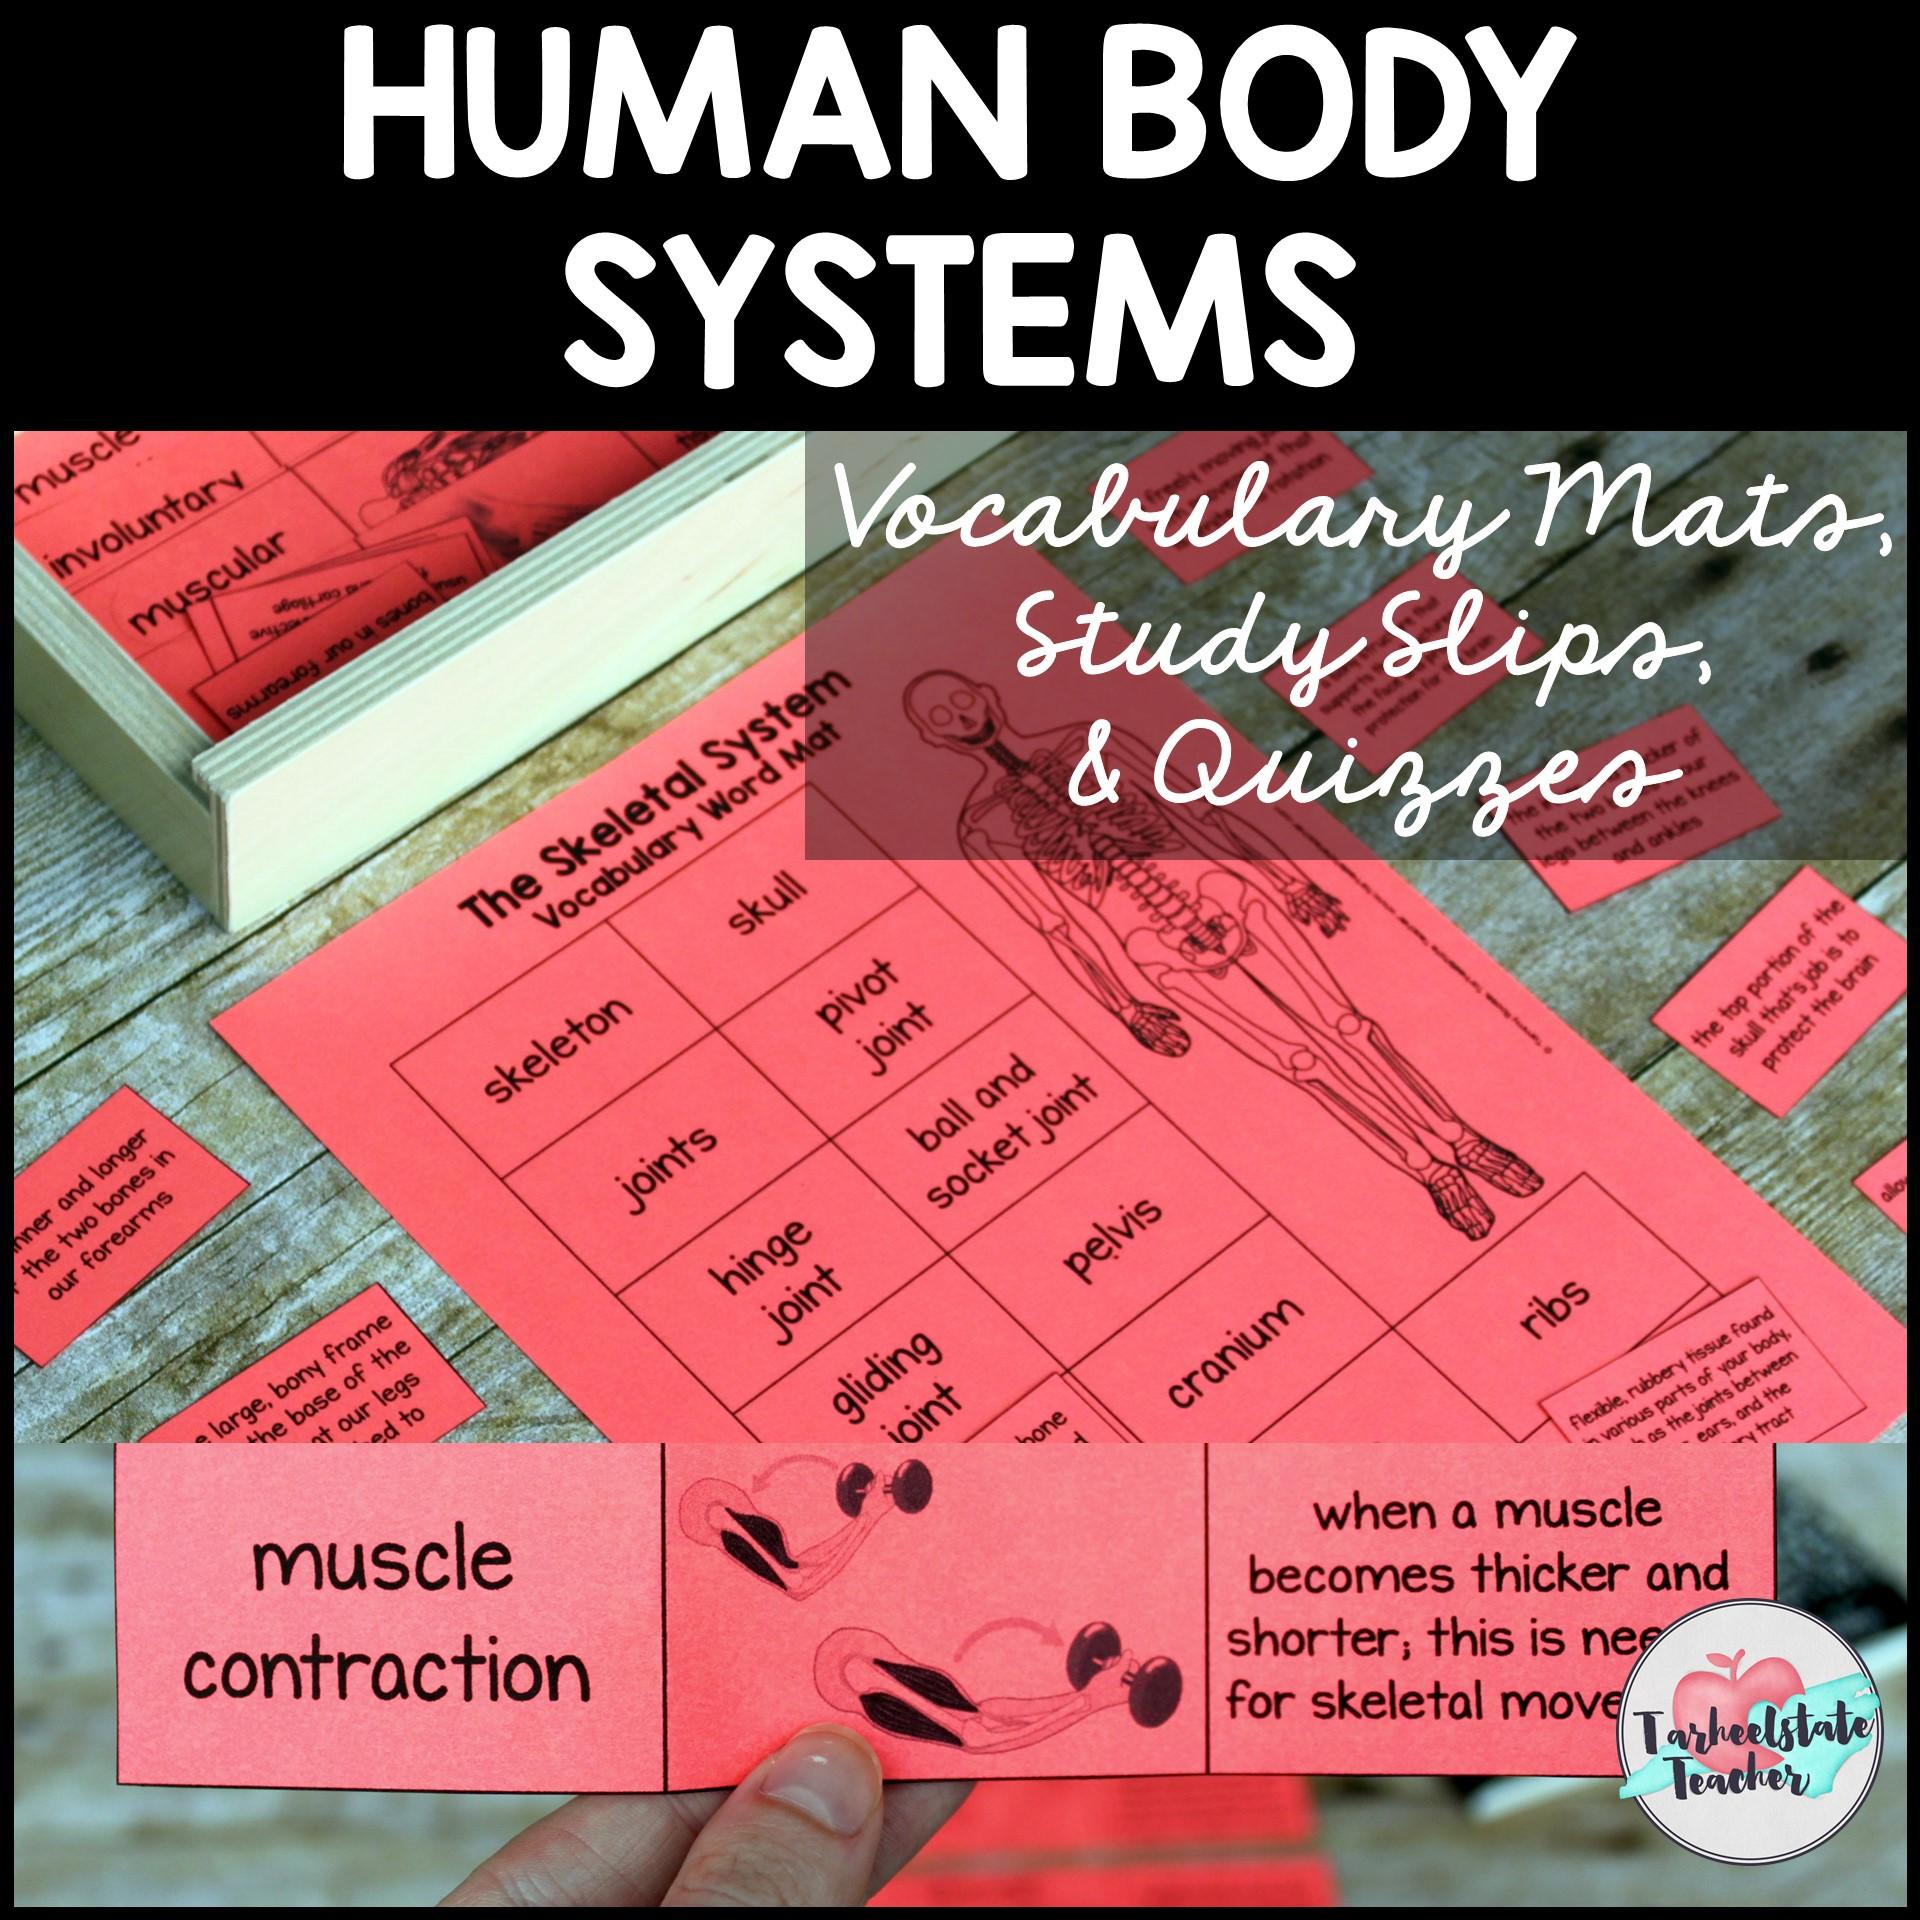 HUMAN BODY SYSTEMS VOCABULARY SETS.jpg